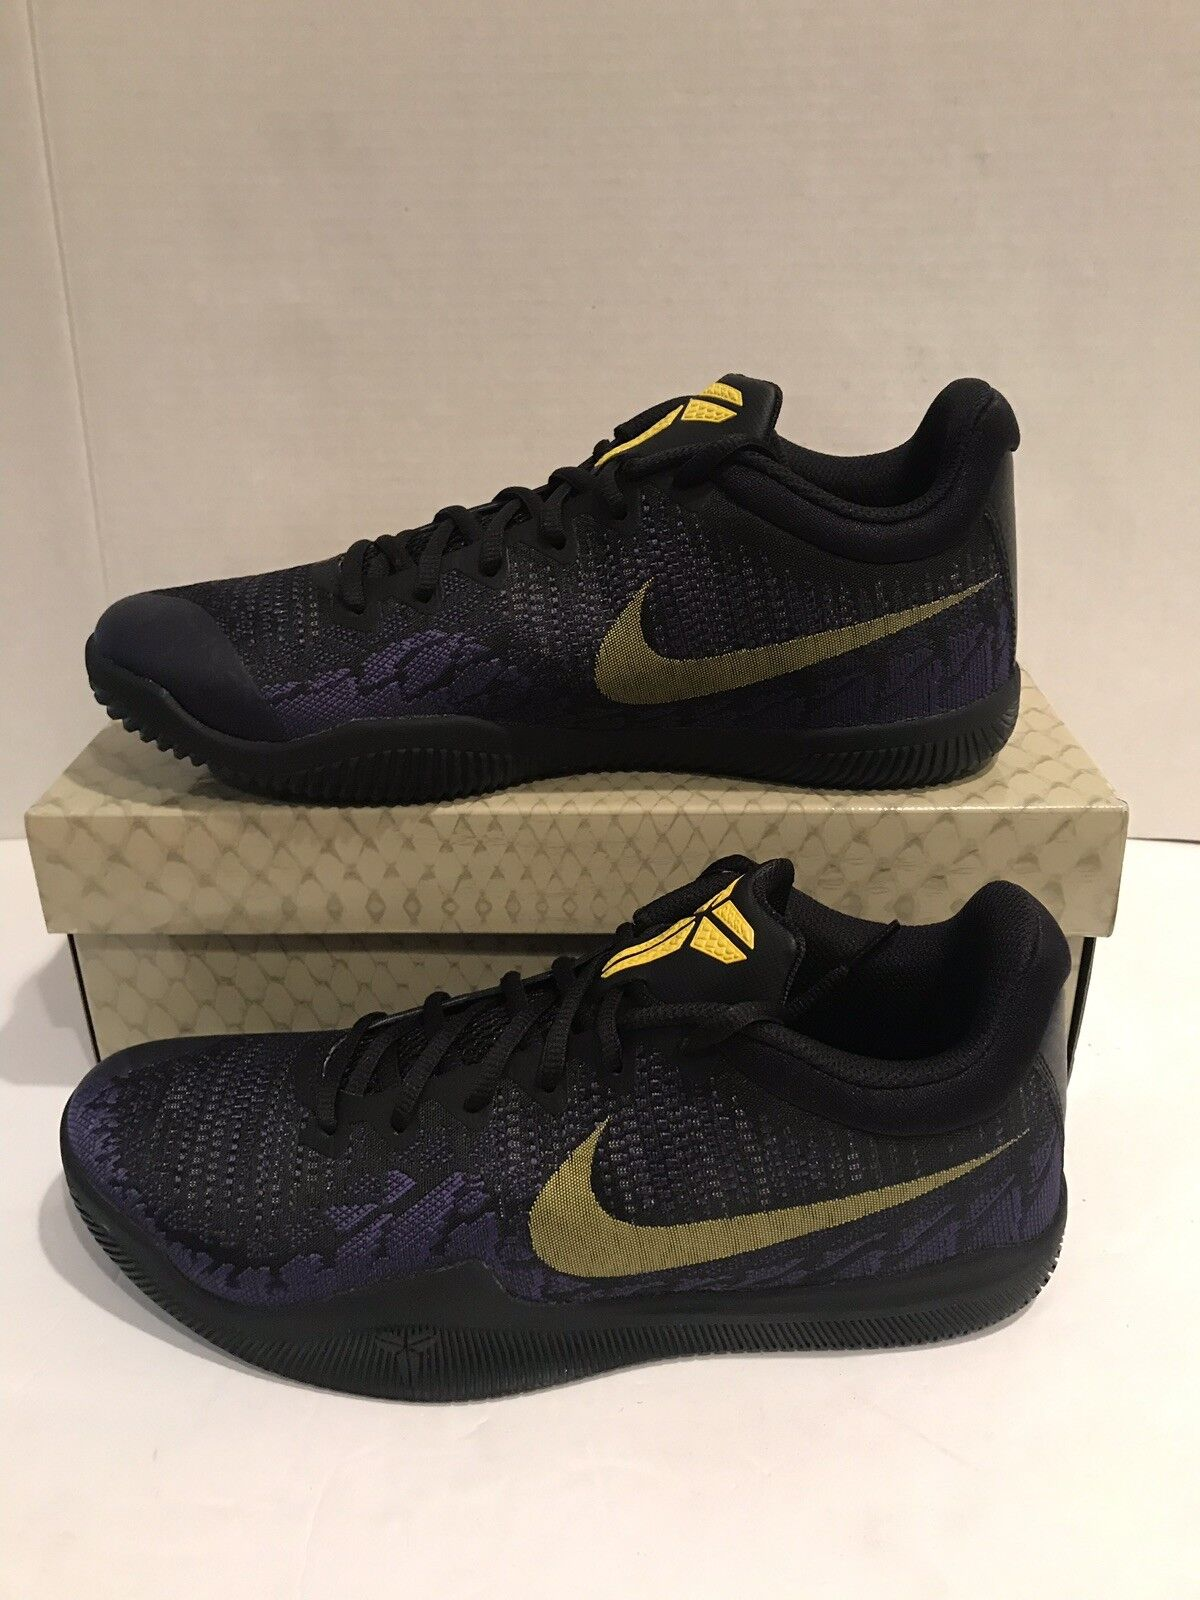 NIKE Men's Kobe Mamba Rage Basketball shoes Black Tour Yellow Purple  908972-024